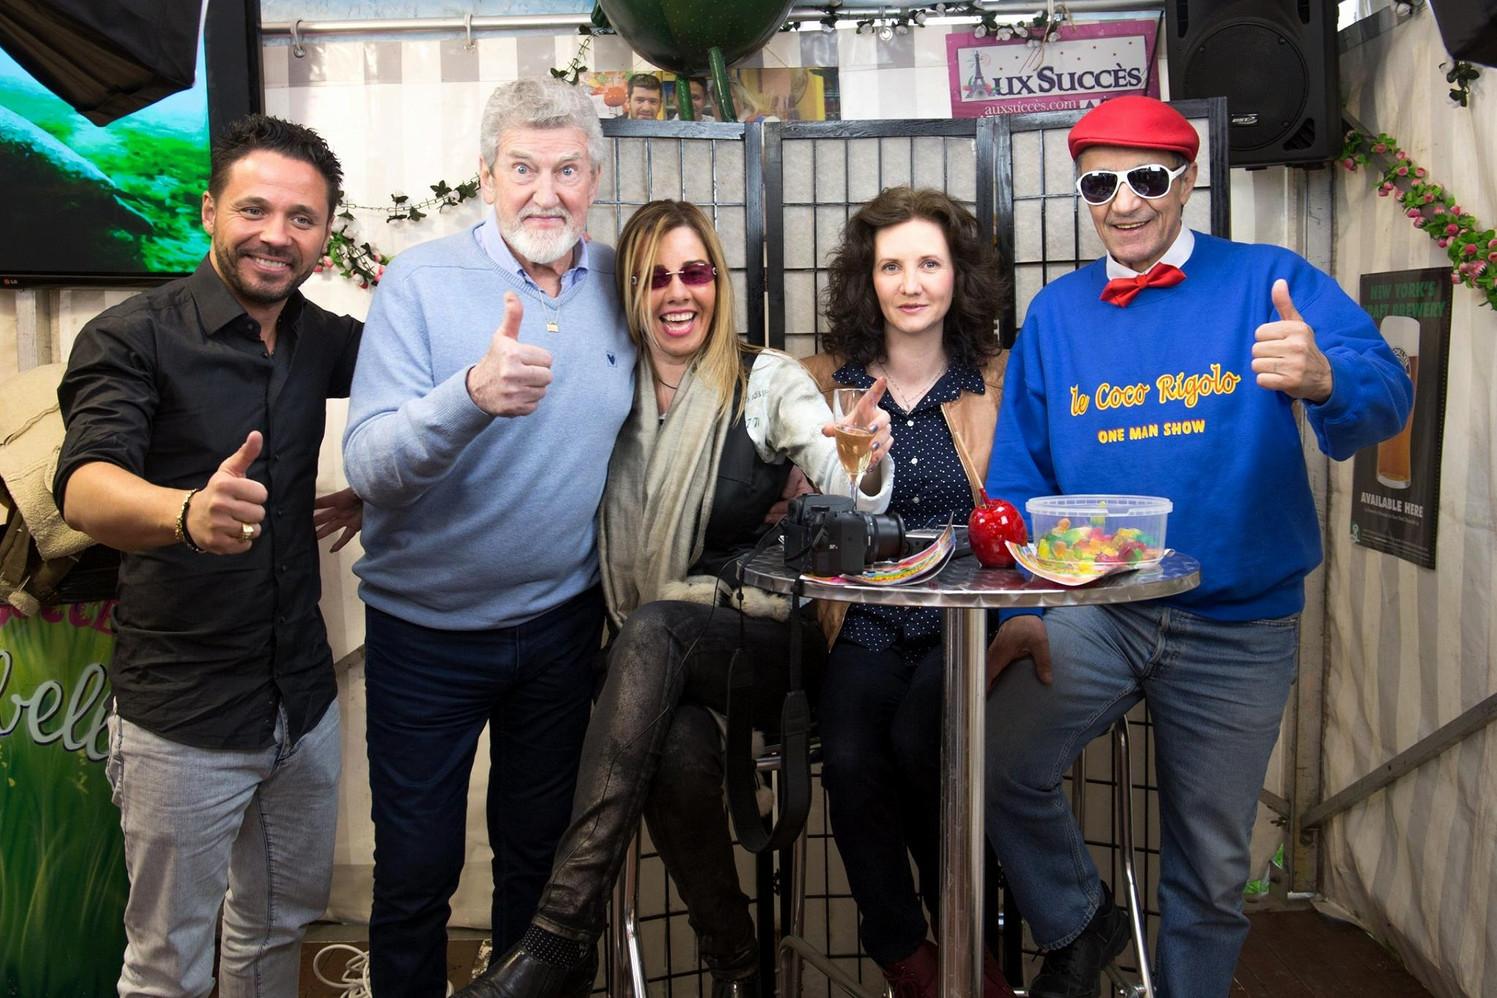 Morgan Joubert, Patrick Préjean, Chris Gabriel, Florence Bouvrot, Philippe Wintouski - Sur la Pellicule - Photo : Jean-José Caddy